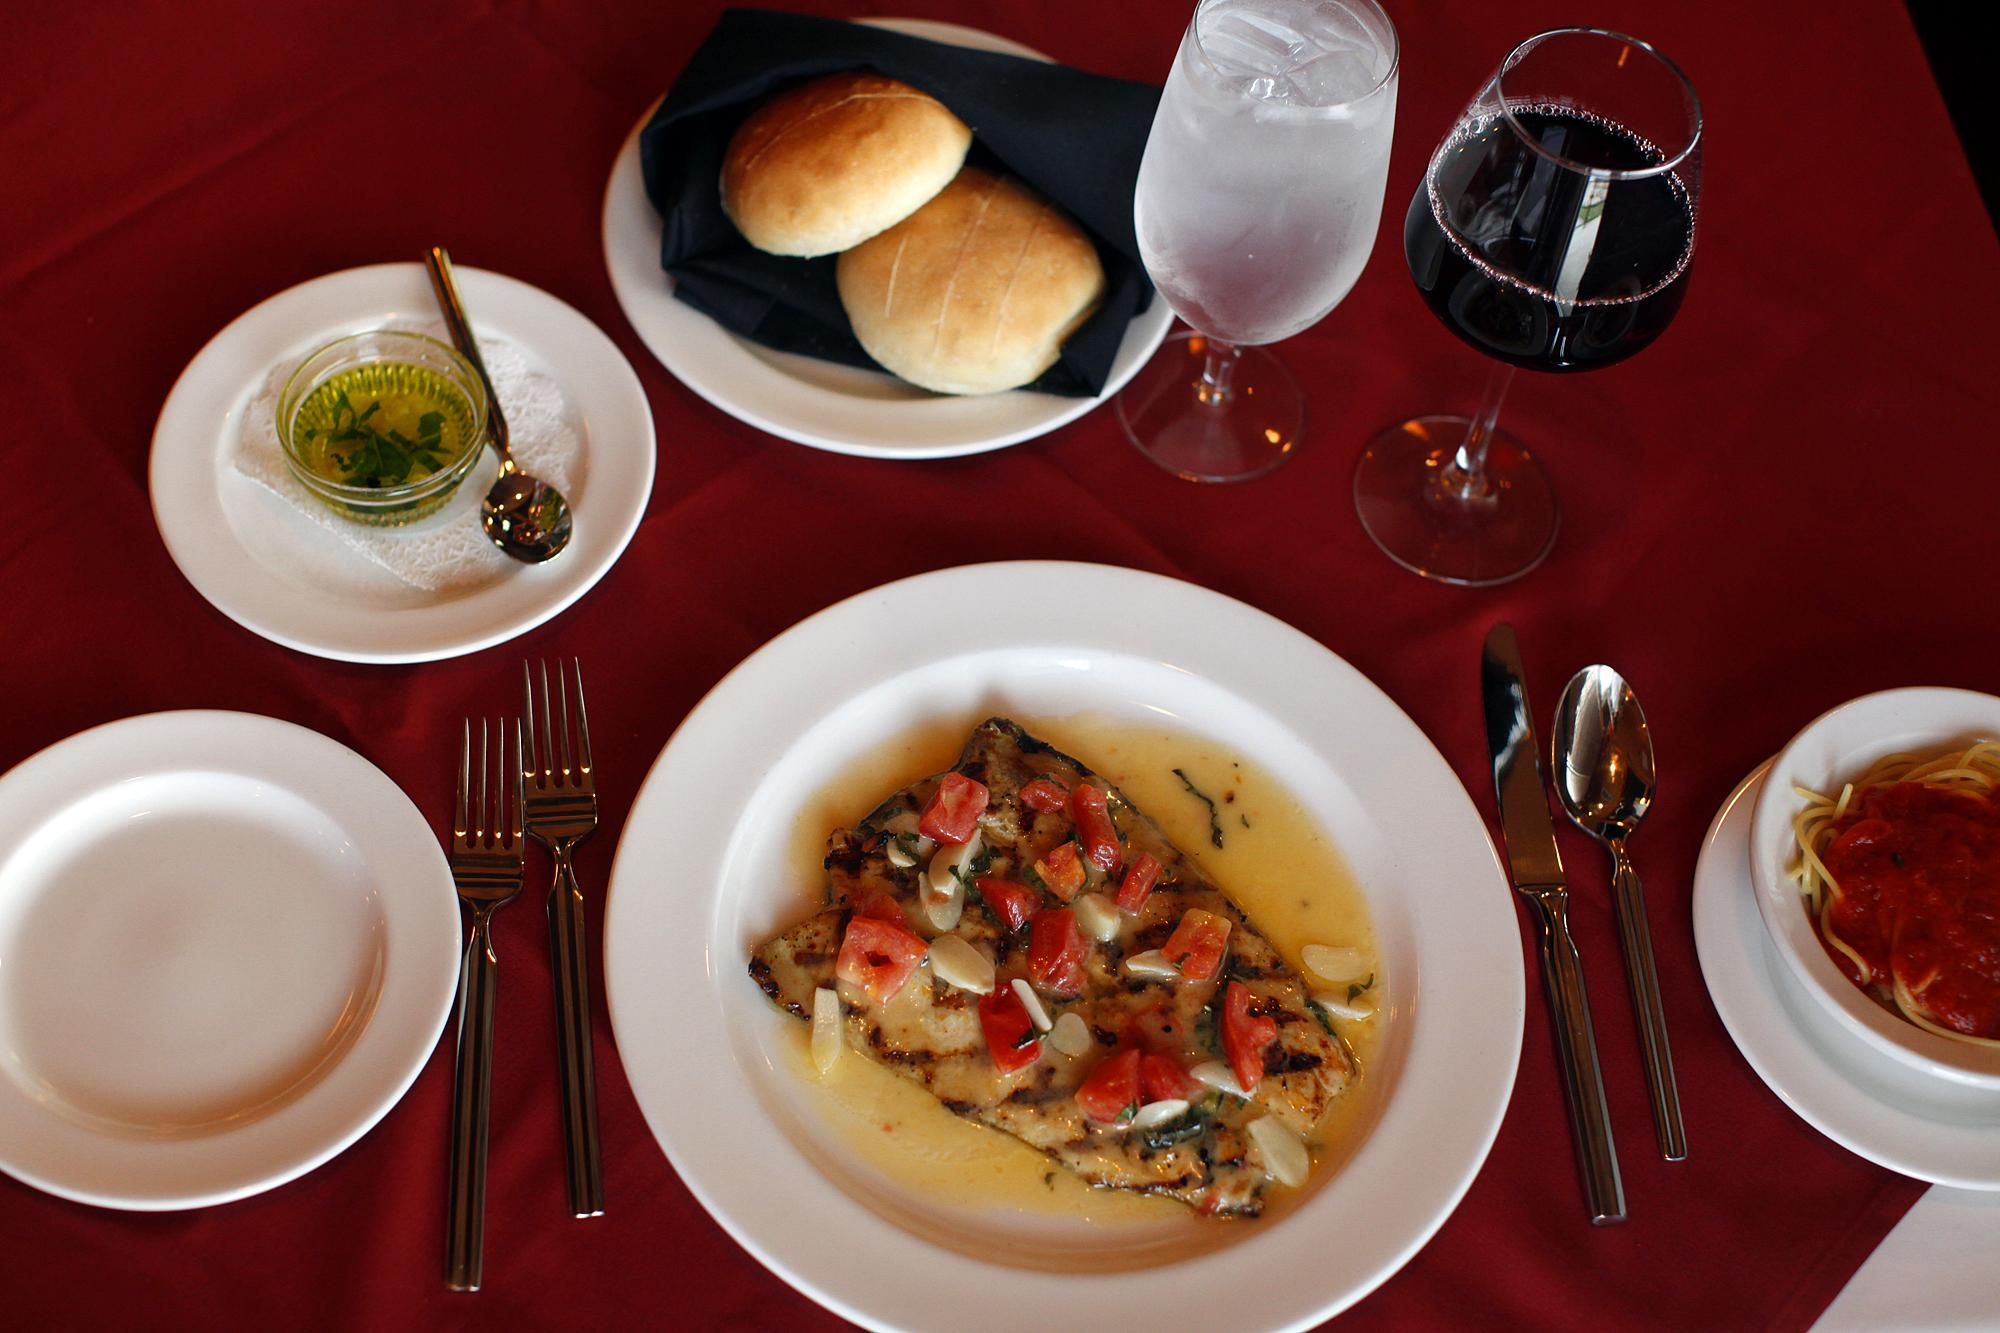 Popular Italian restaurant Scuzzi s expands to Leon Springs San